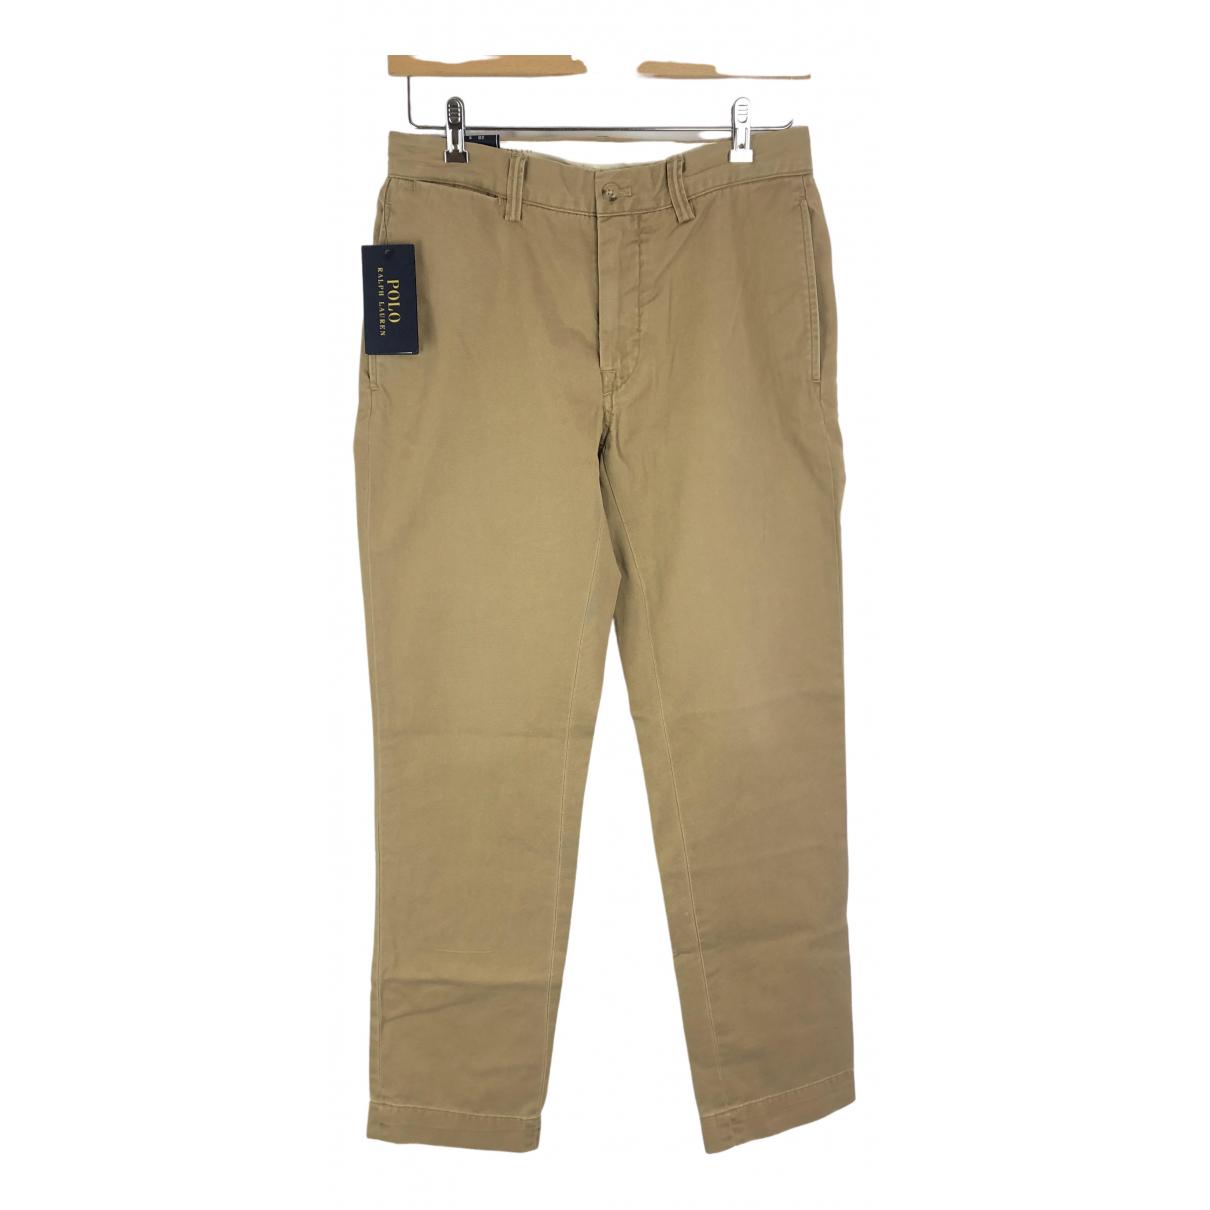 Polo Ralph Lauren \N Beige Cotton Trousers for Men 28 UK - US